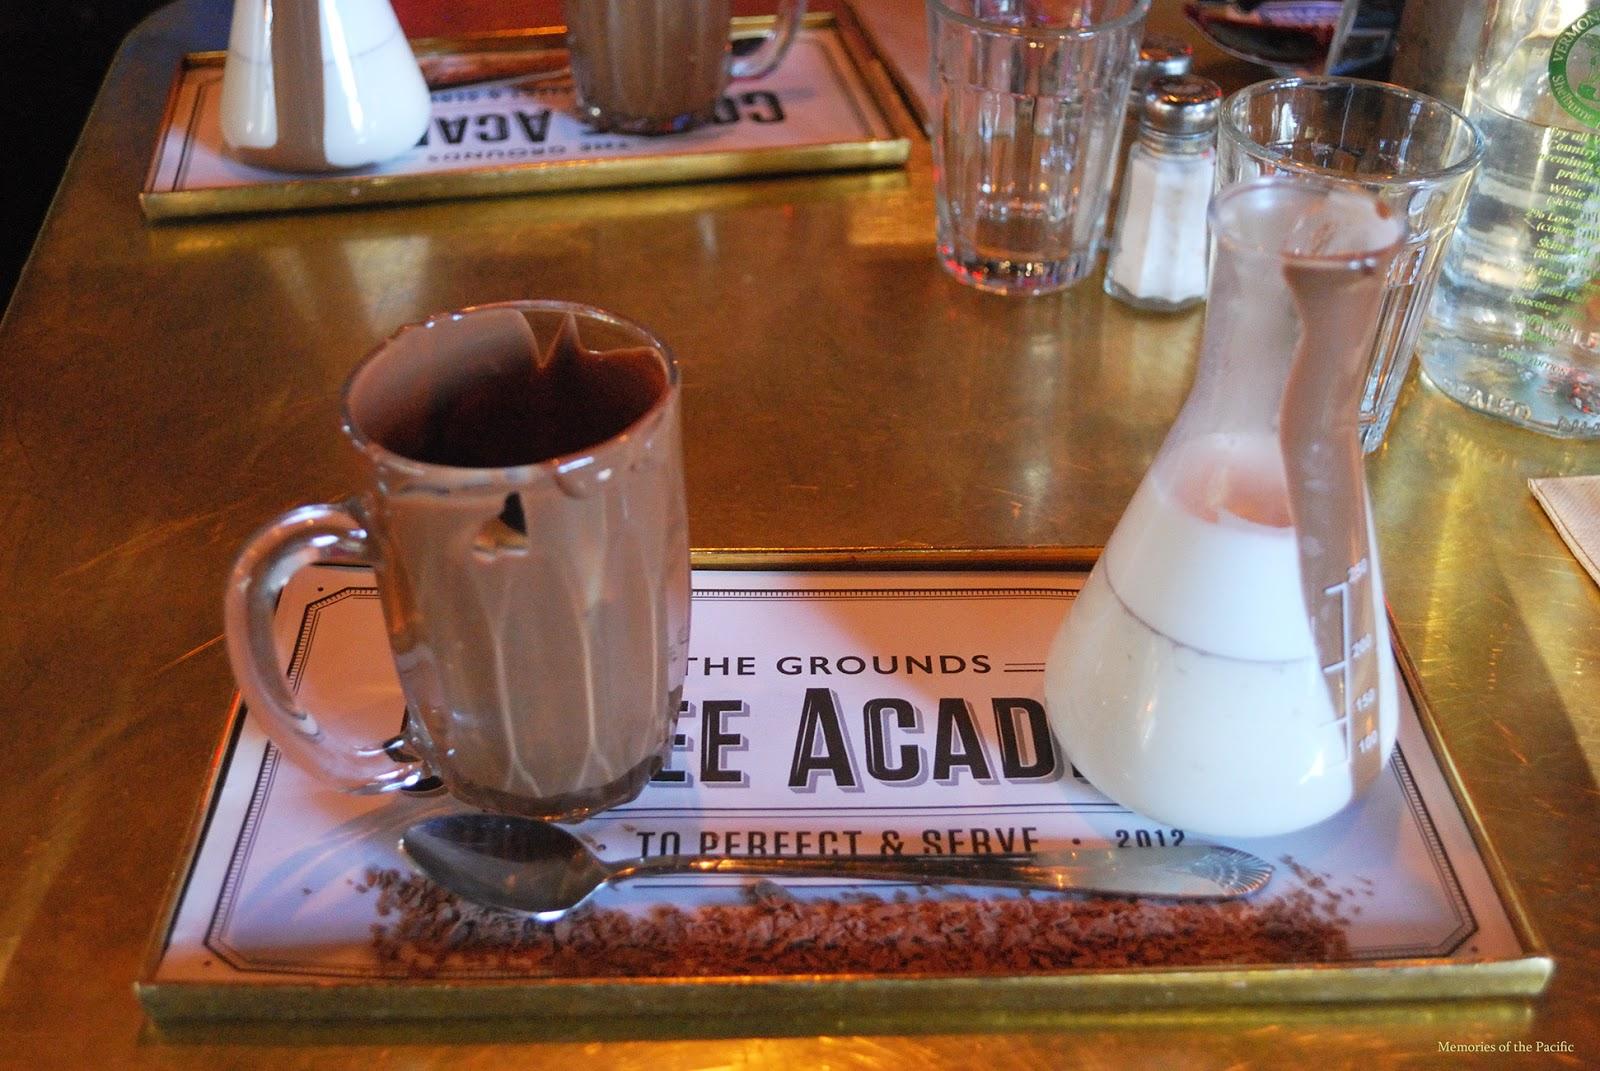 grounds alexandria cafe restaurant sydney australia